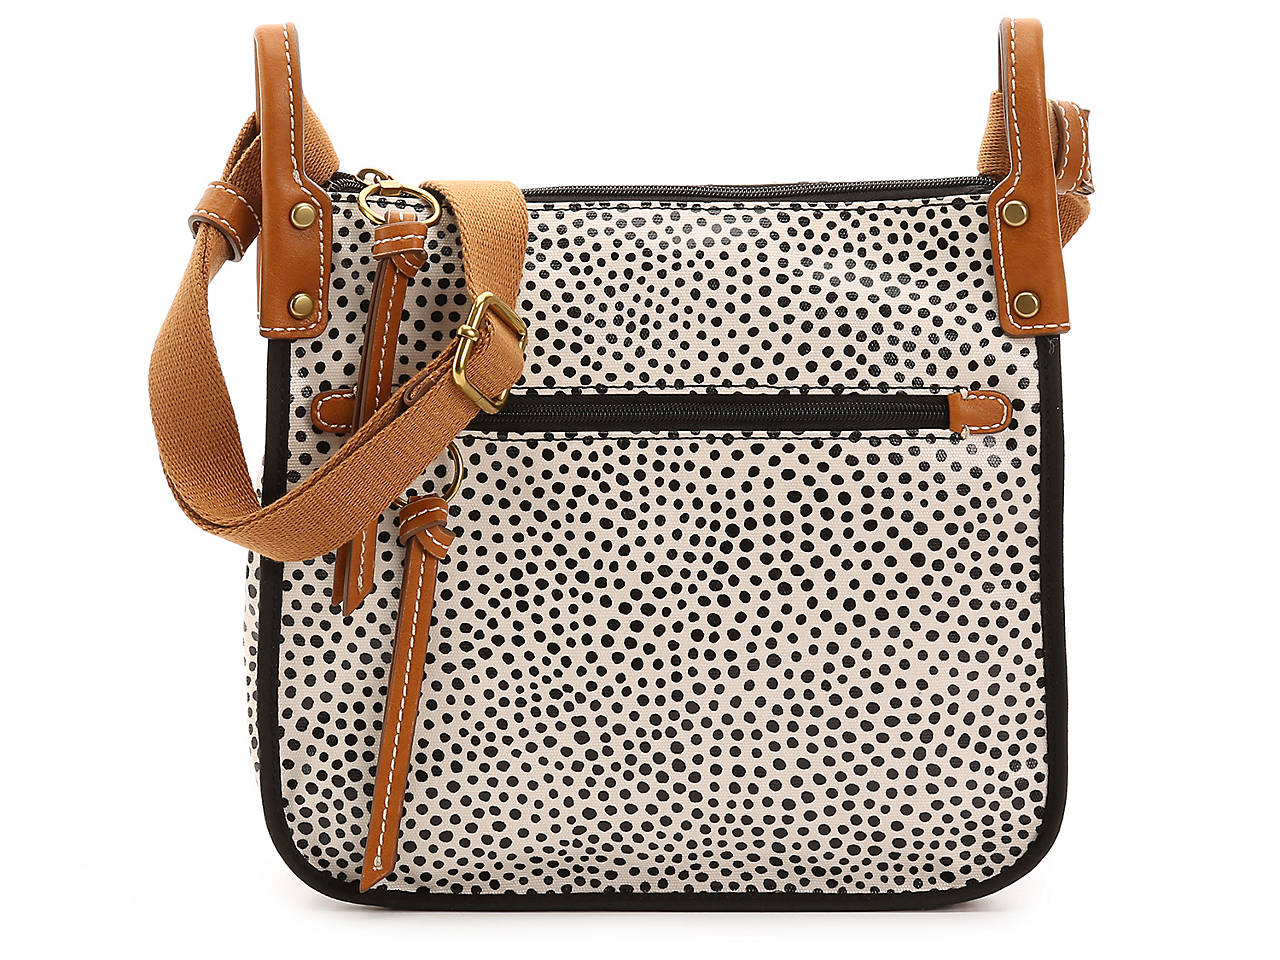 e9f398f4954 Fossil Keyper Crossbody Bag Women's Handbags & Accessories | DSW